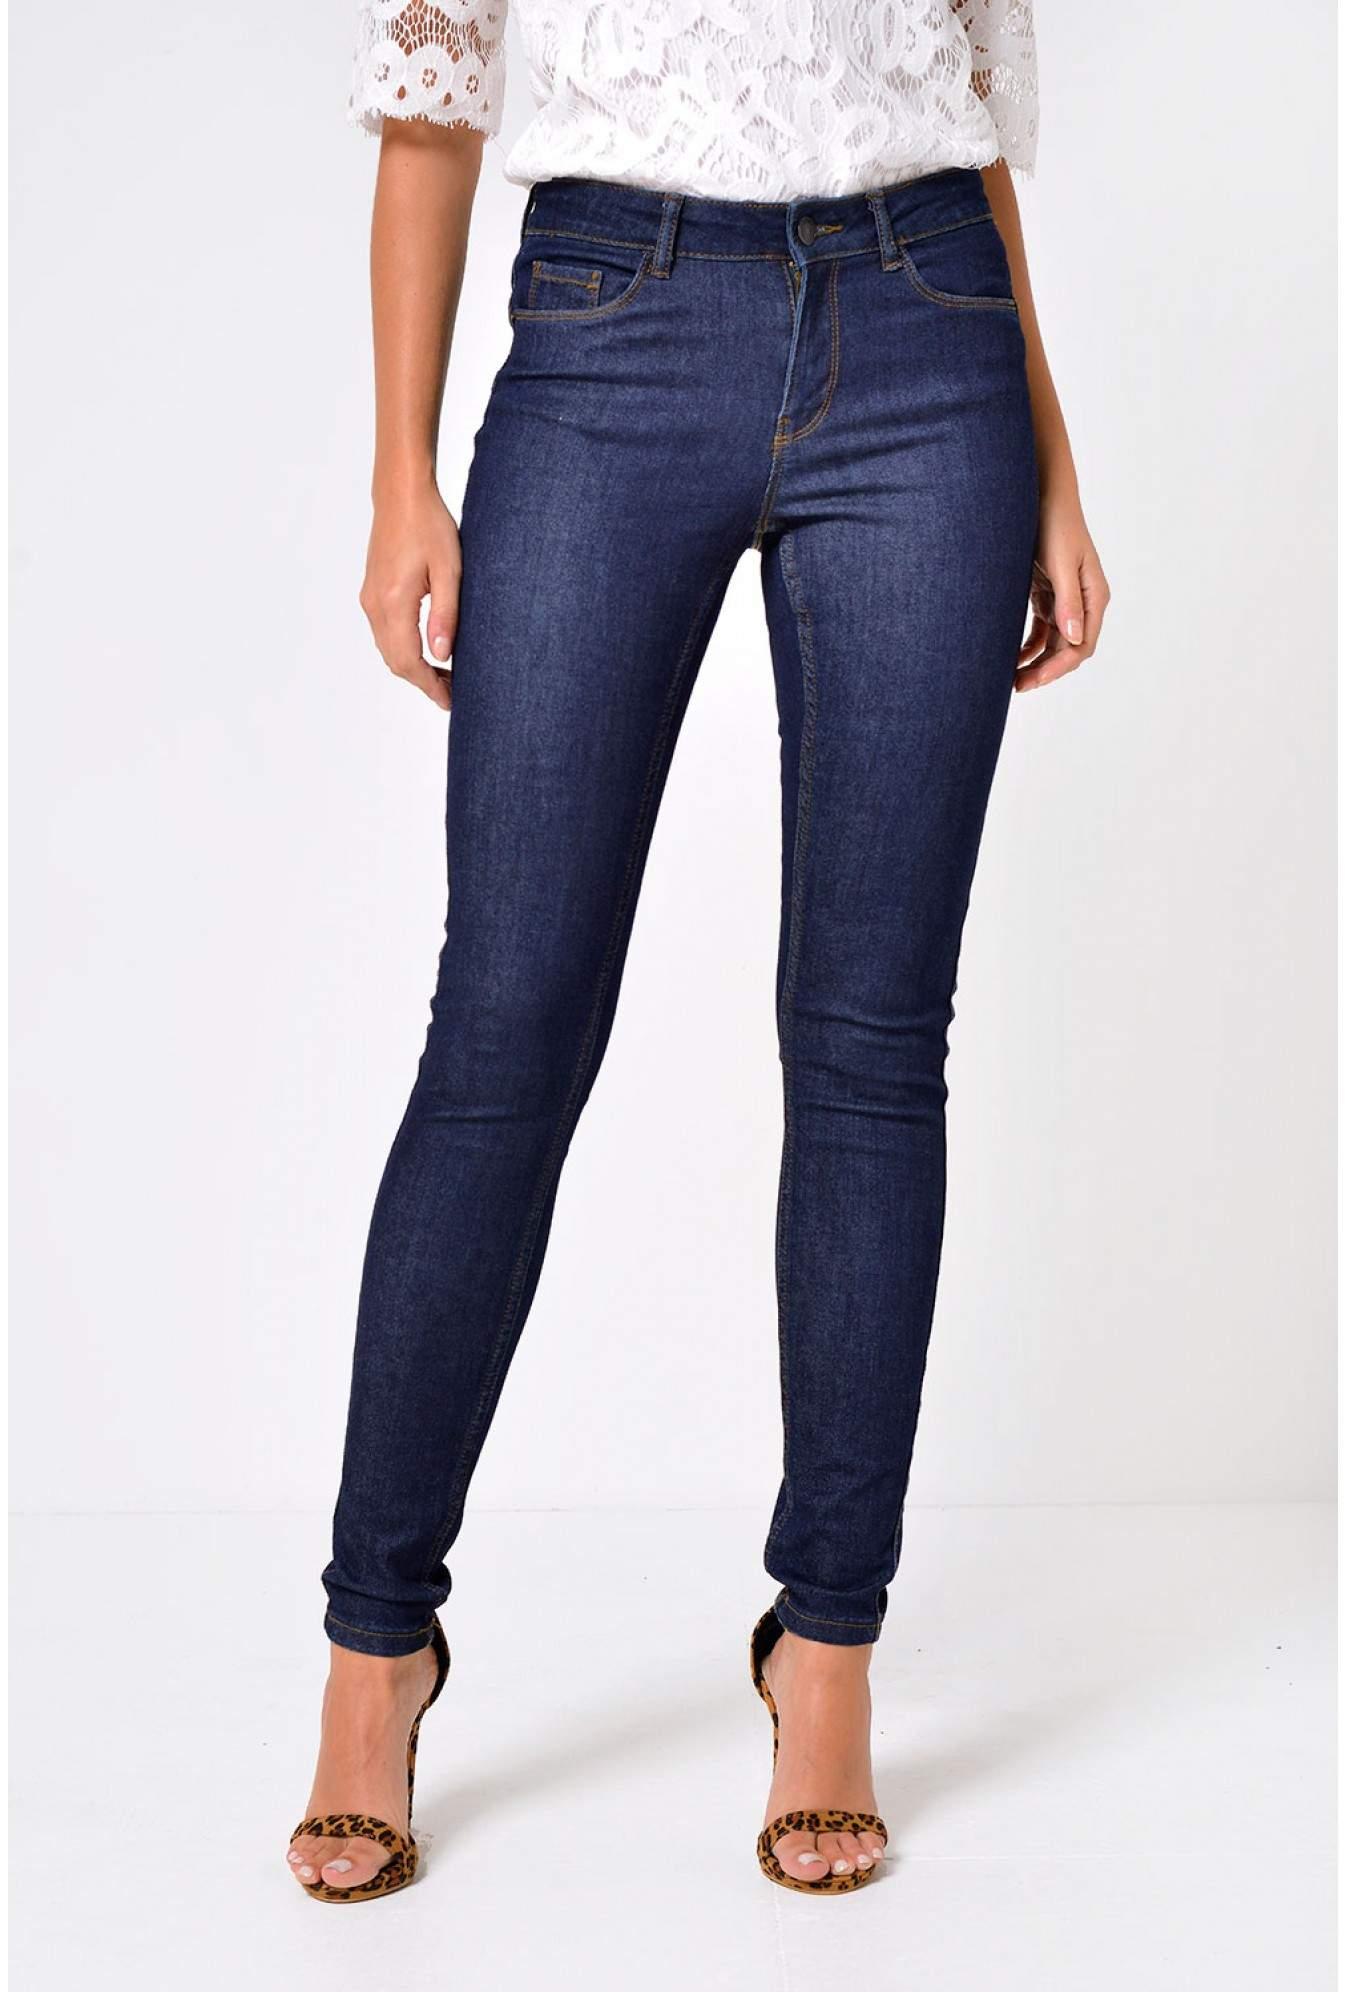 More Views. Seven Regular Shape Up Jeans in Dark Blue. Vero Moda 1e2238f1a